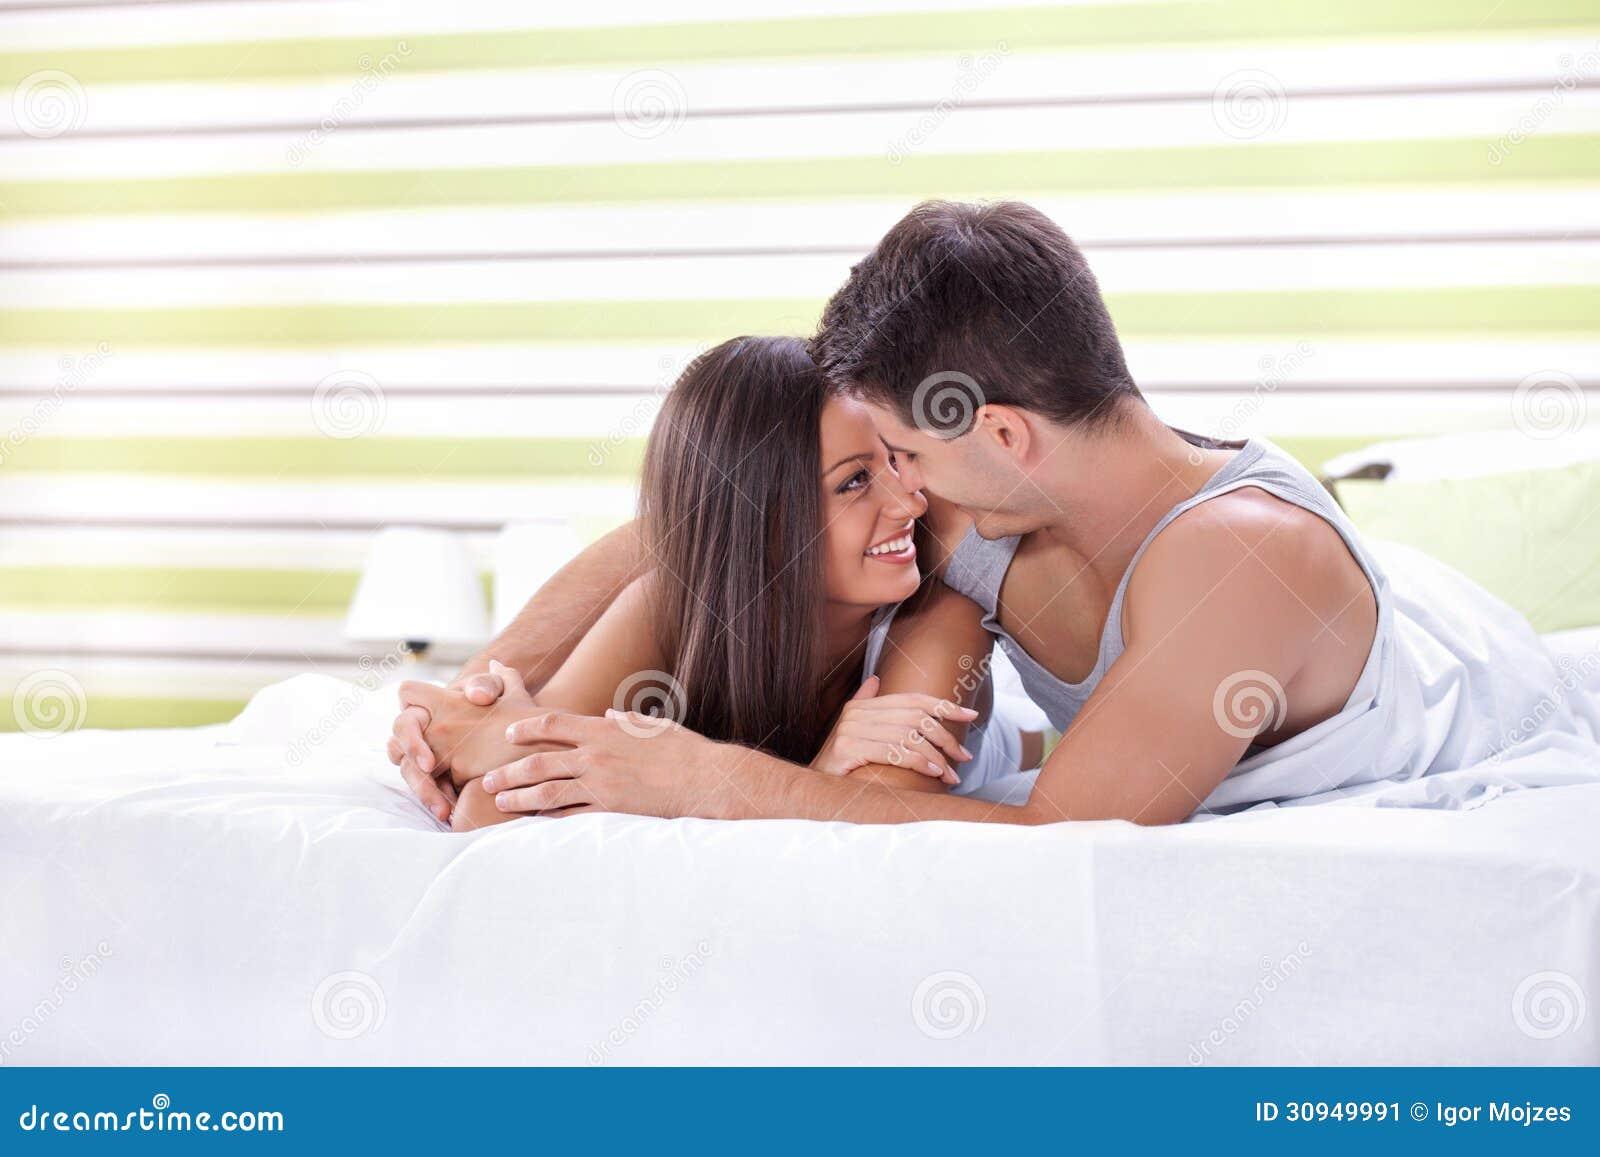 What Men Love In The Bedroom   cukjatidesign com cukjatidesign com Men Working On Laptop And Woman Reading Book In Bedroom Royalty